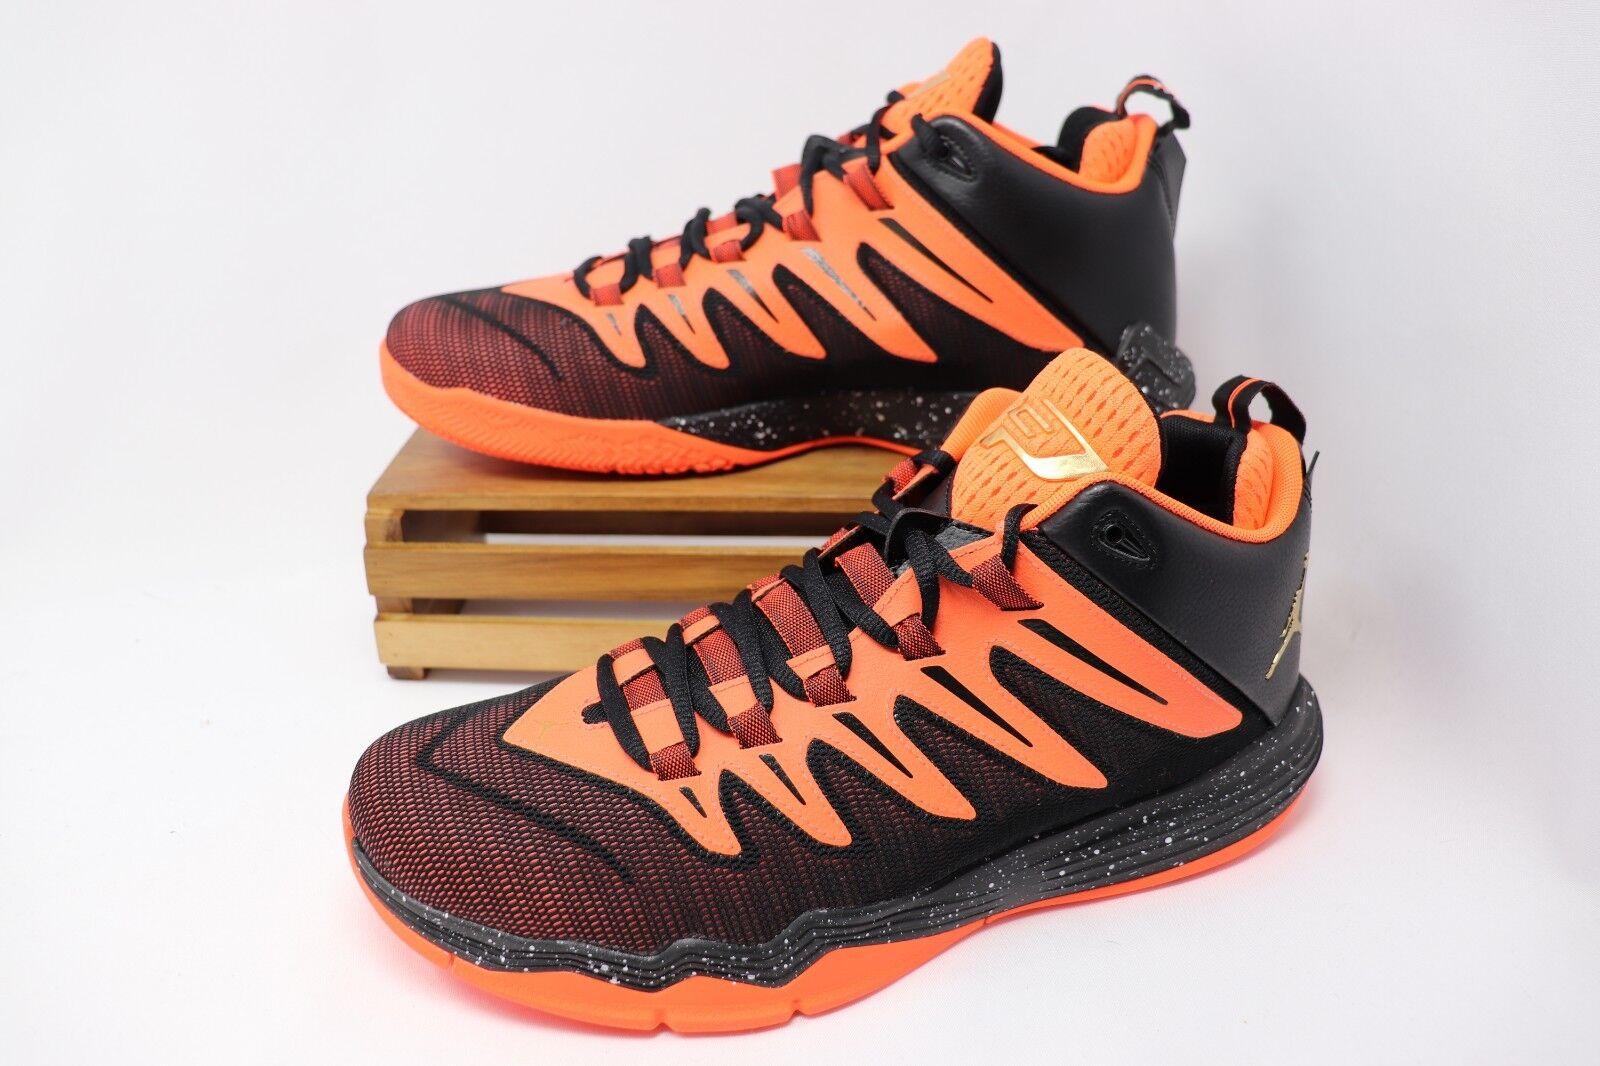 Nike Air Jordan CP3 IX Chris Paul Hyper orange gold Black 810868-802 Men's NEW